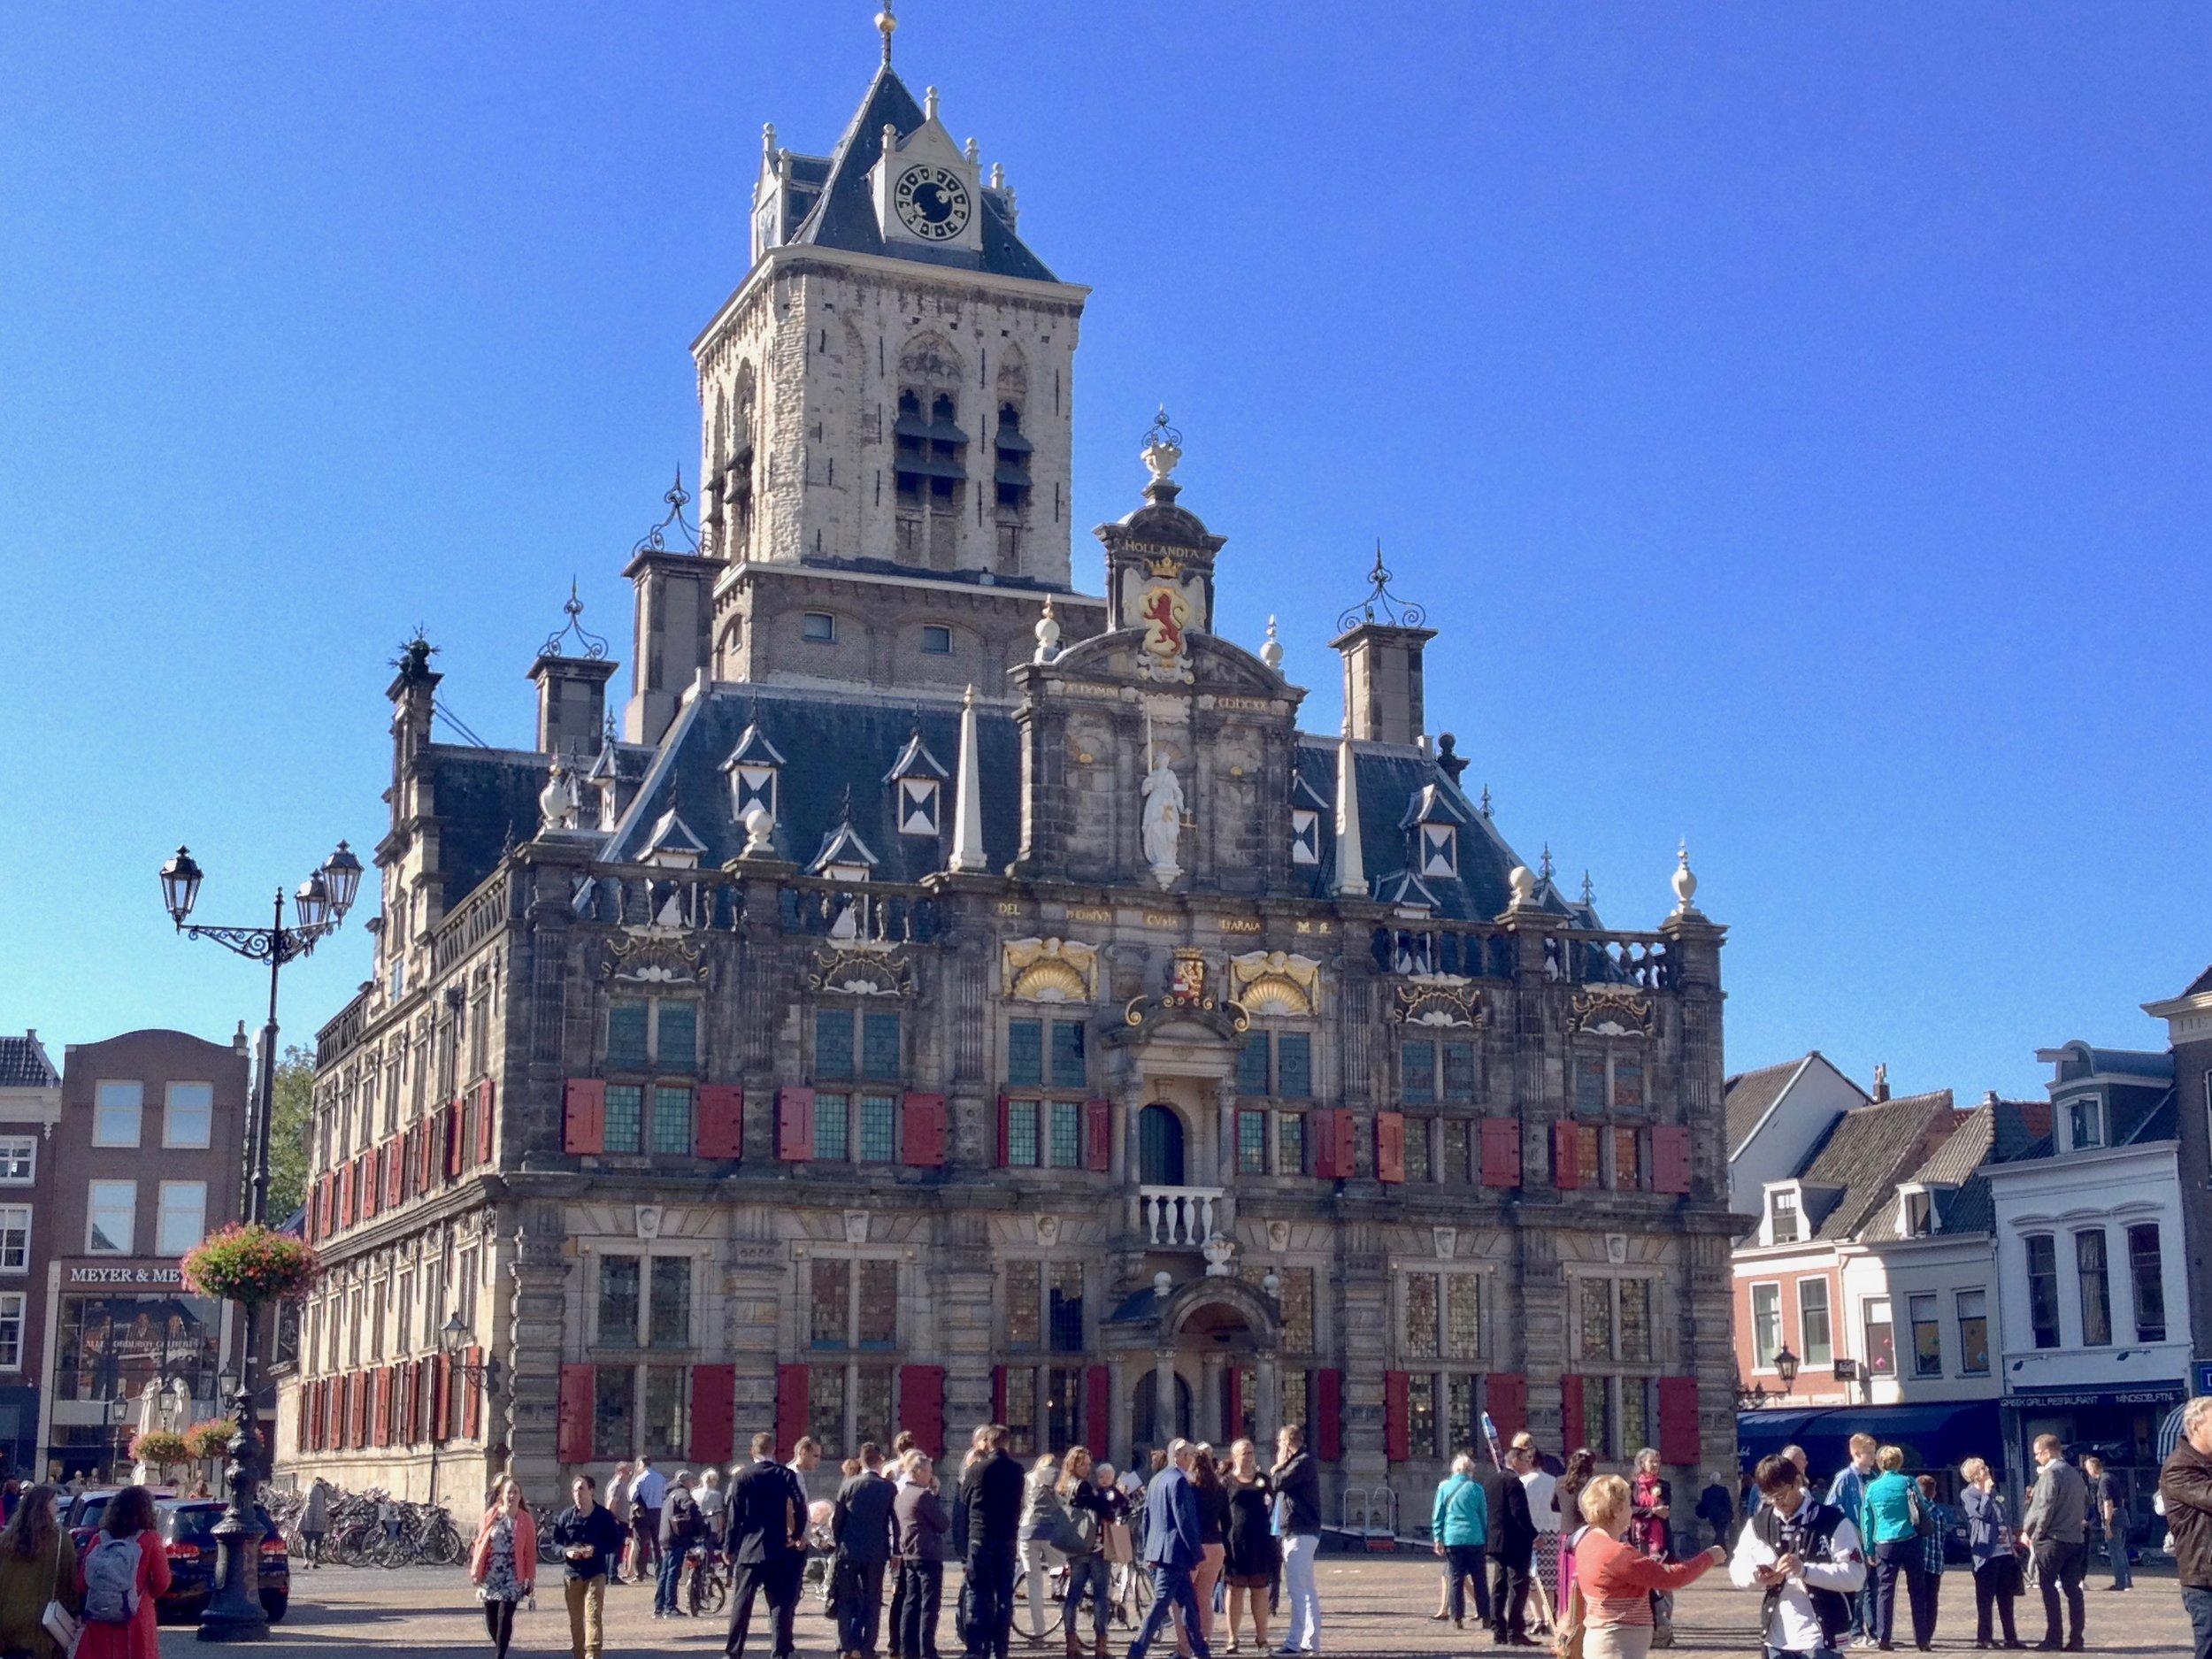 One last picture of Delft.